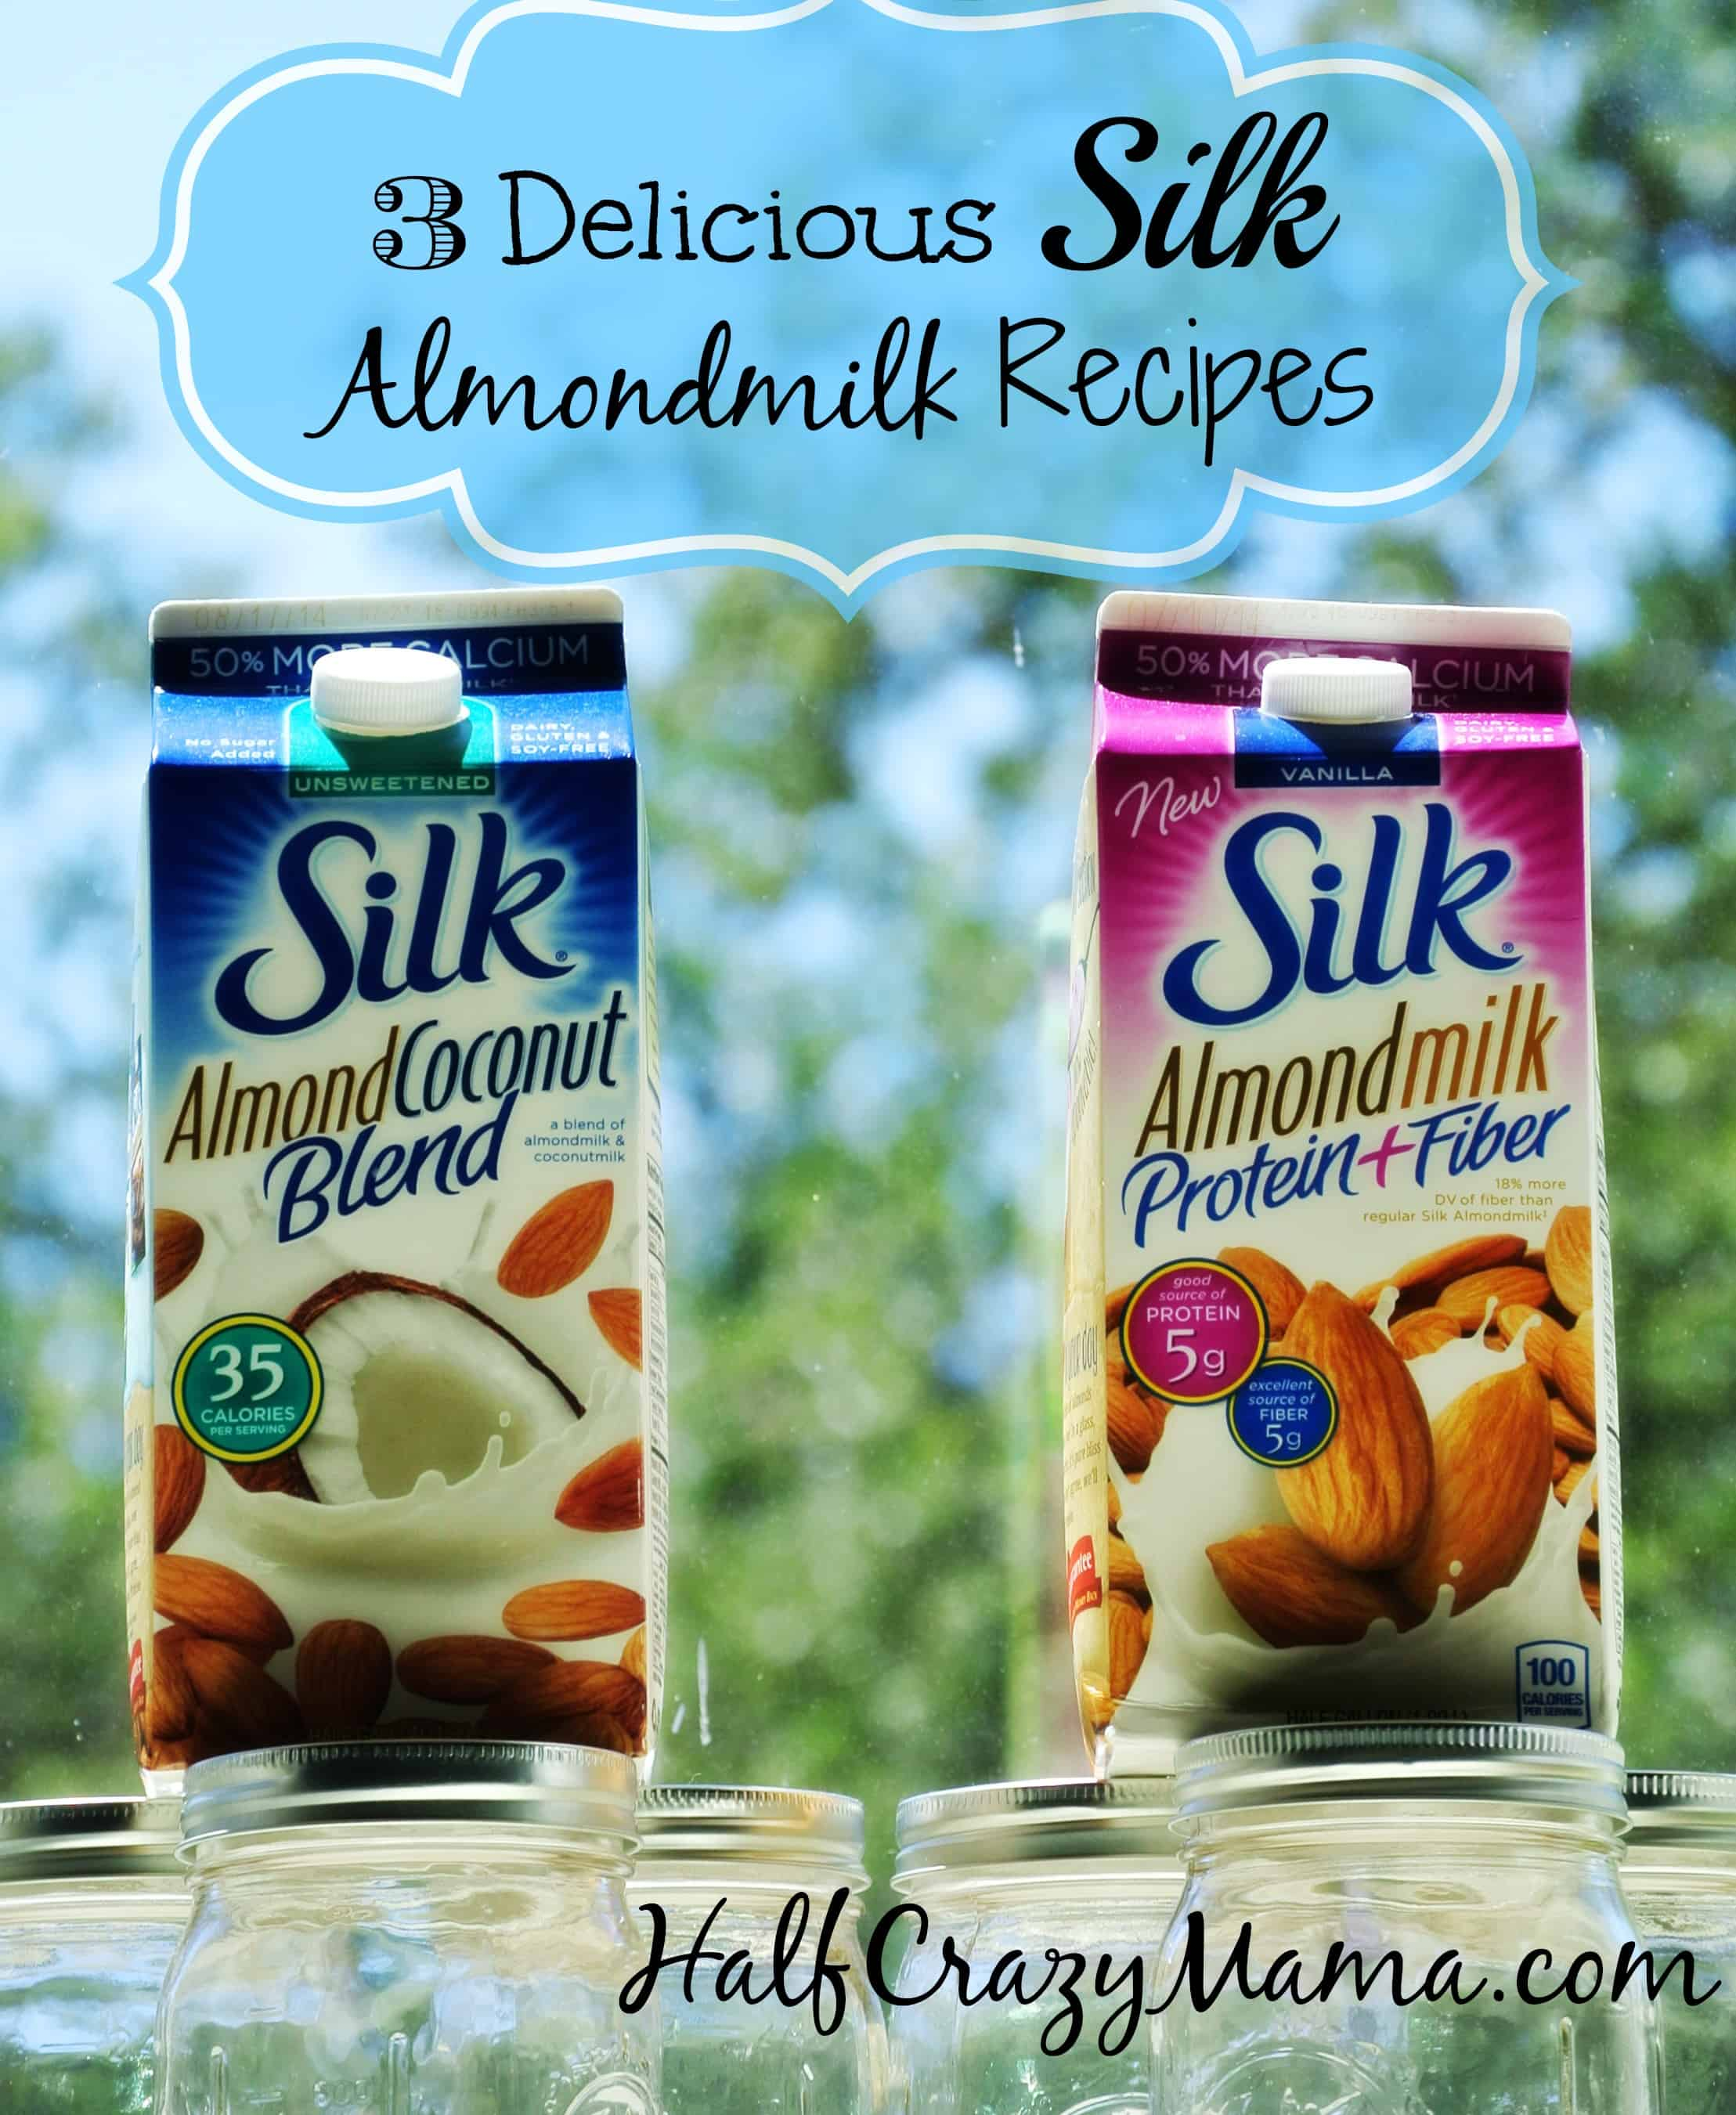 Silk Almondmilk recipes